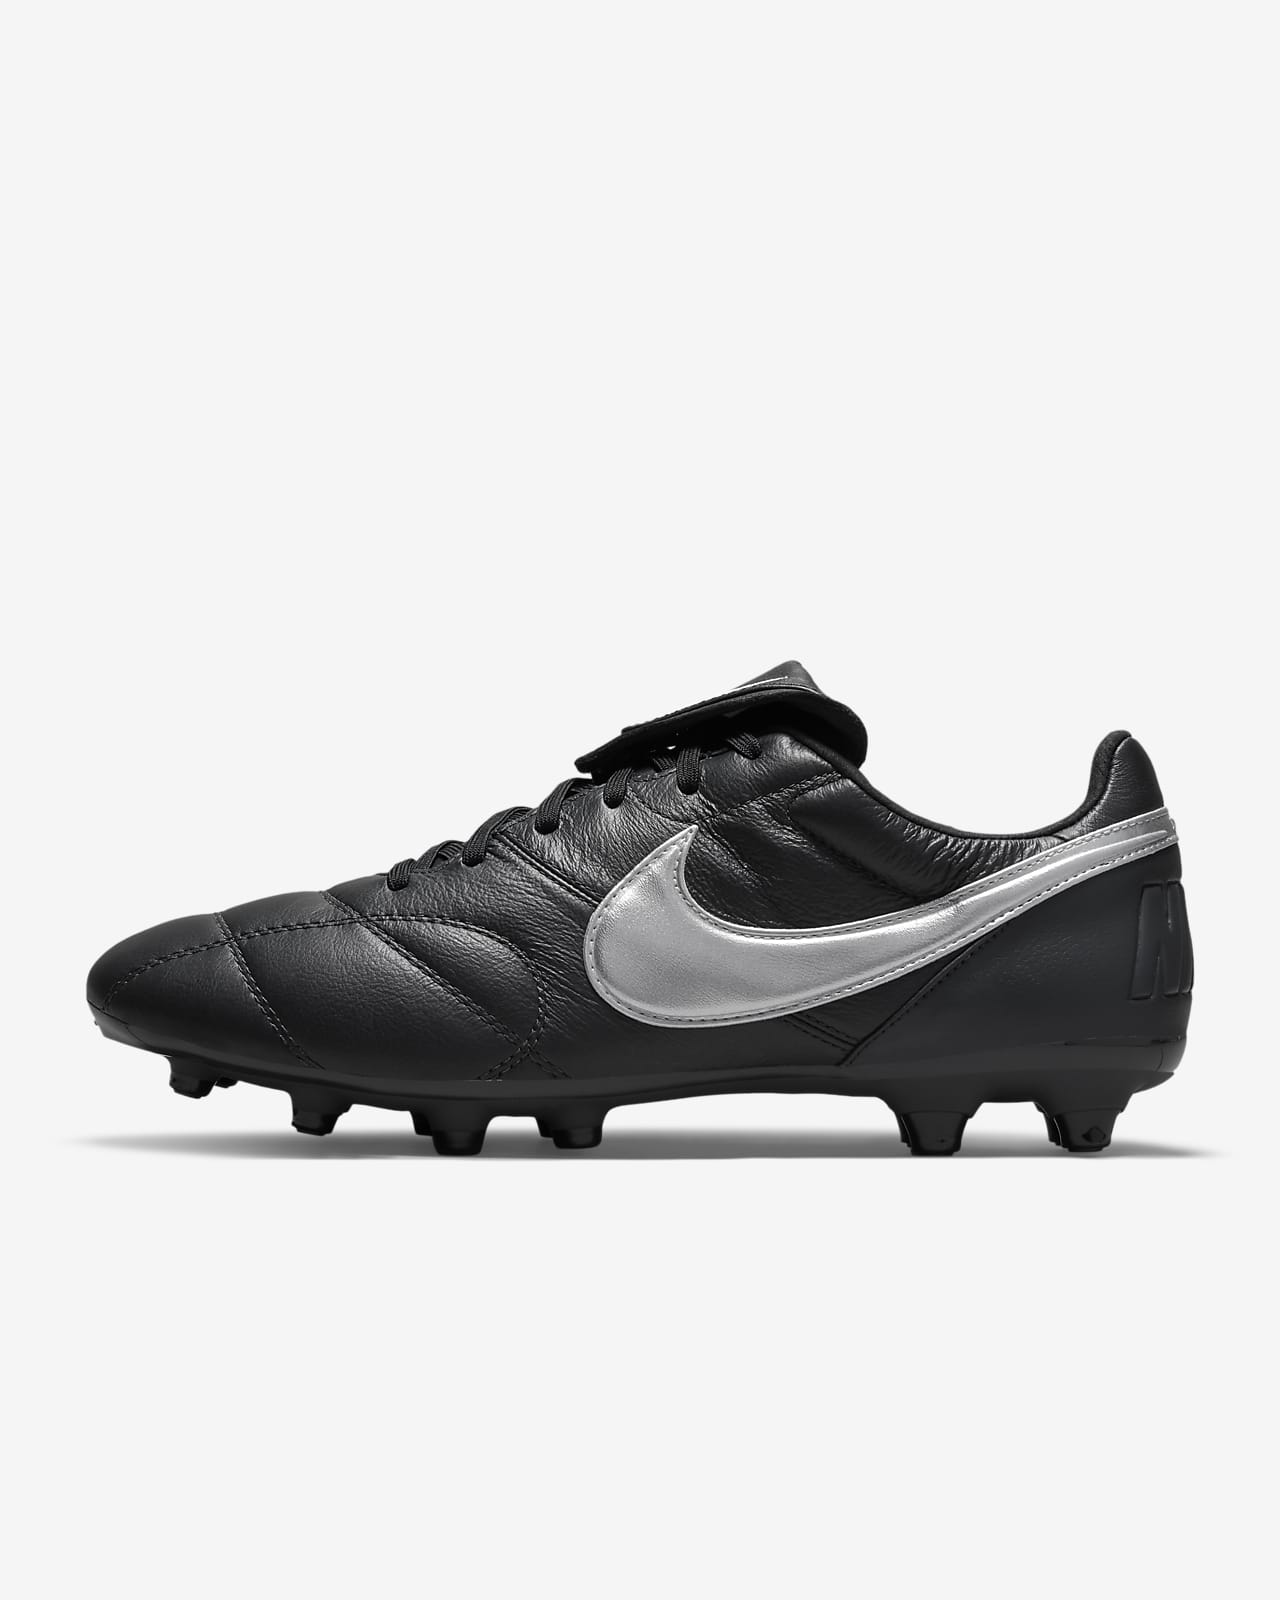 Nike Premier II FG Firm-Ground Soccer